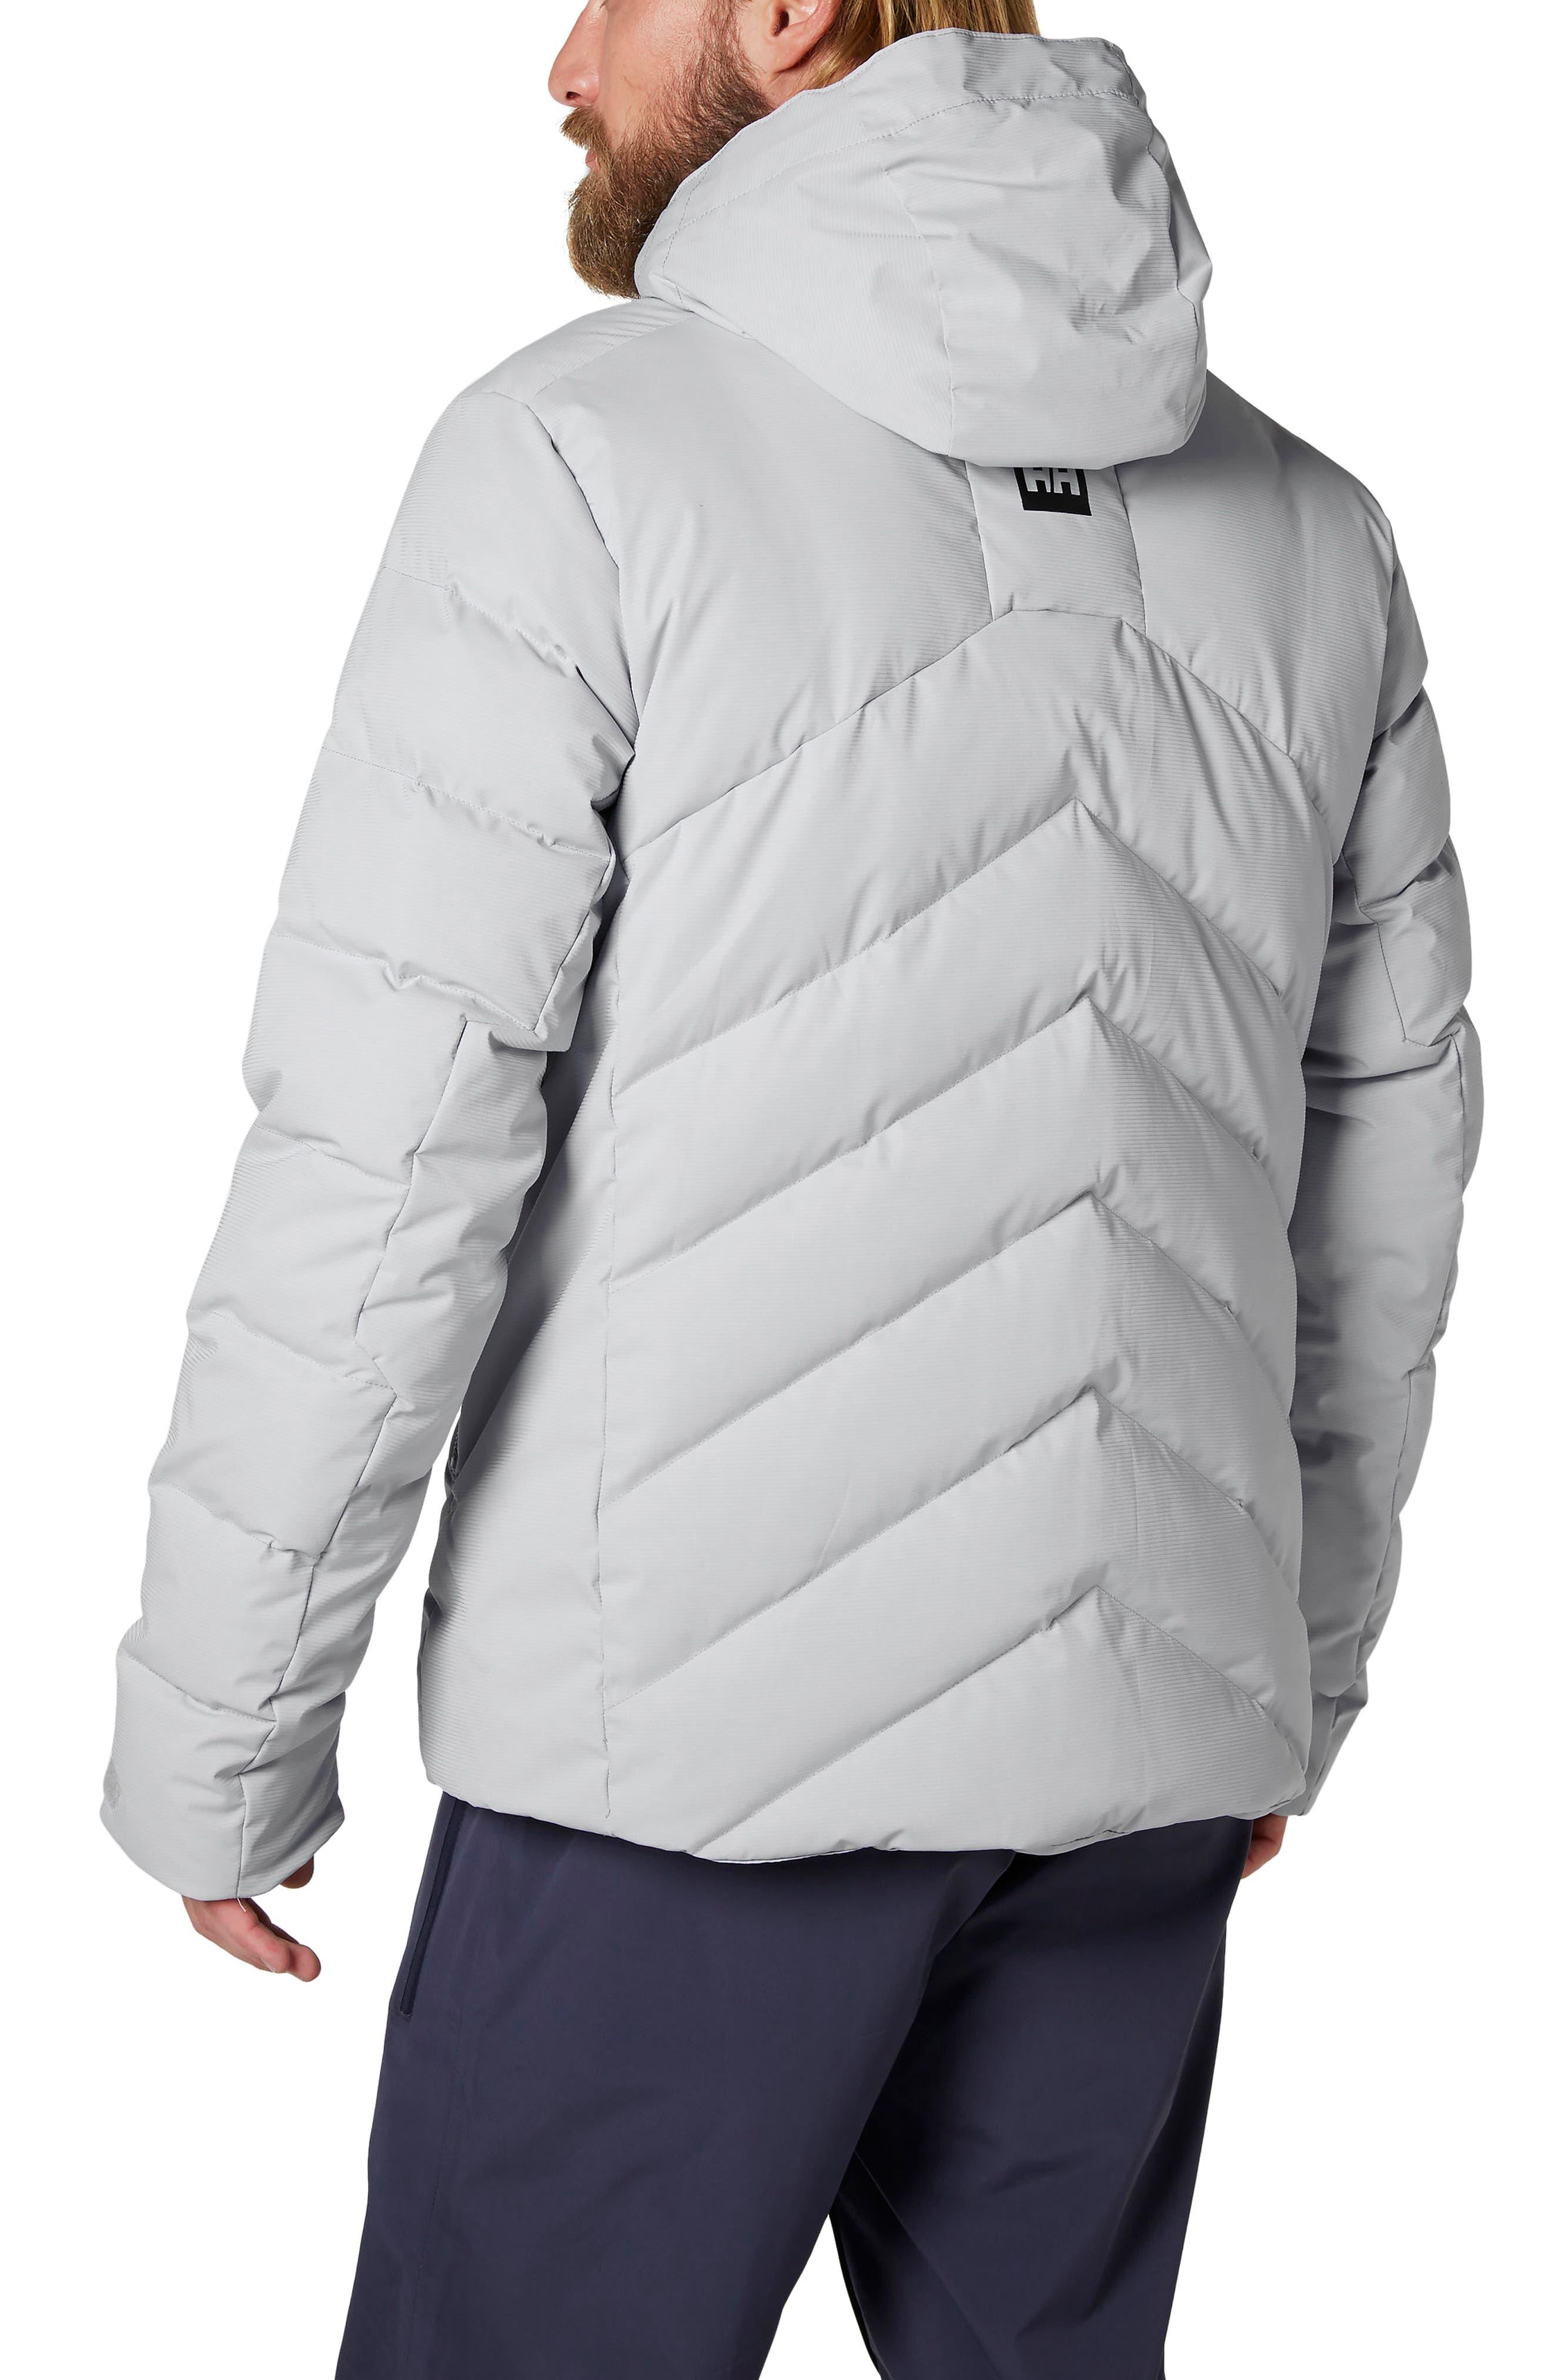 Swift Waterproof Down Hooded Jacket,                             Alternate thumbnail 2, color,                             Light Grey